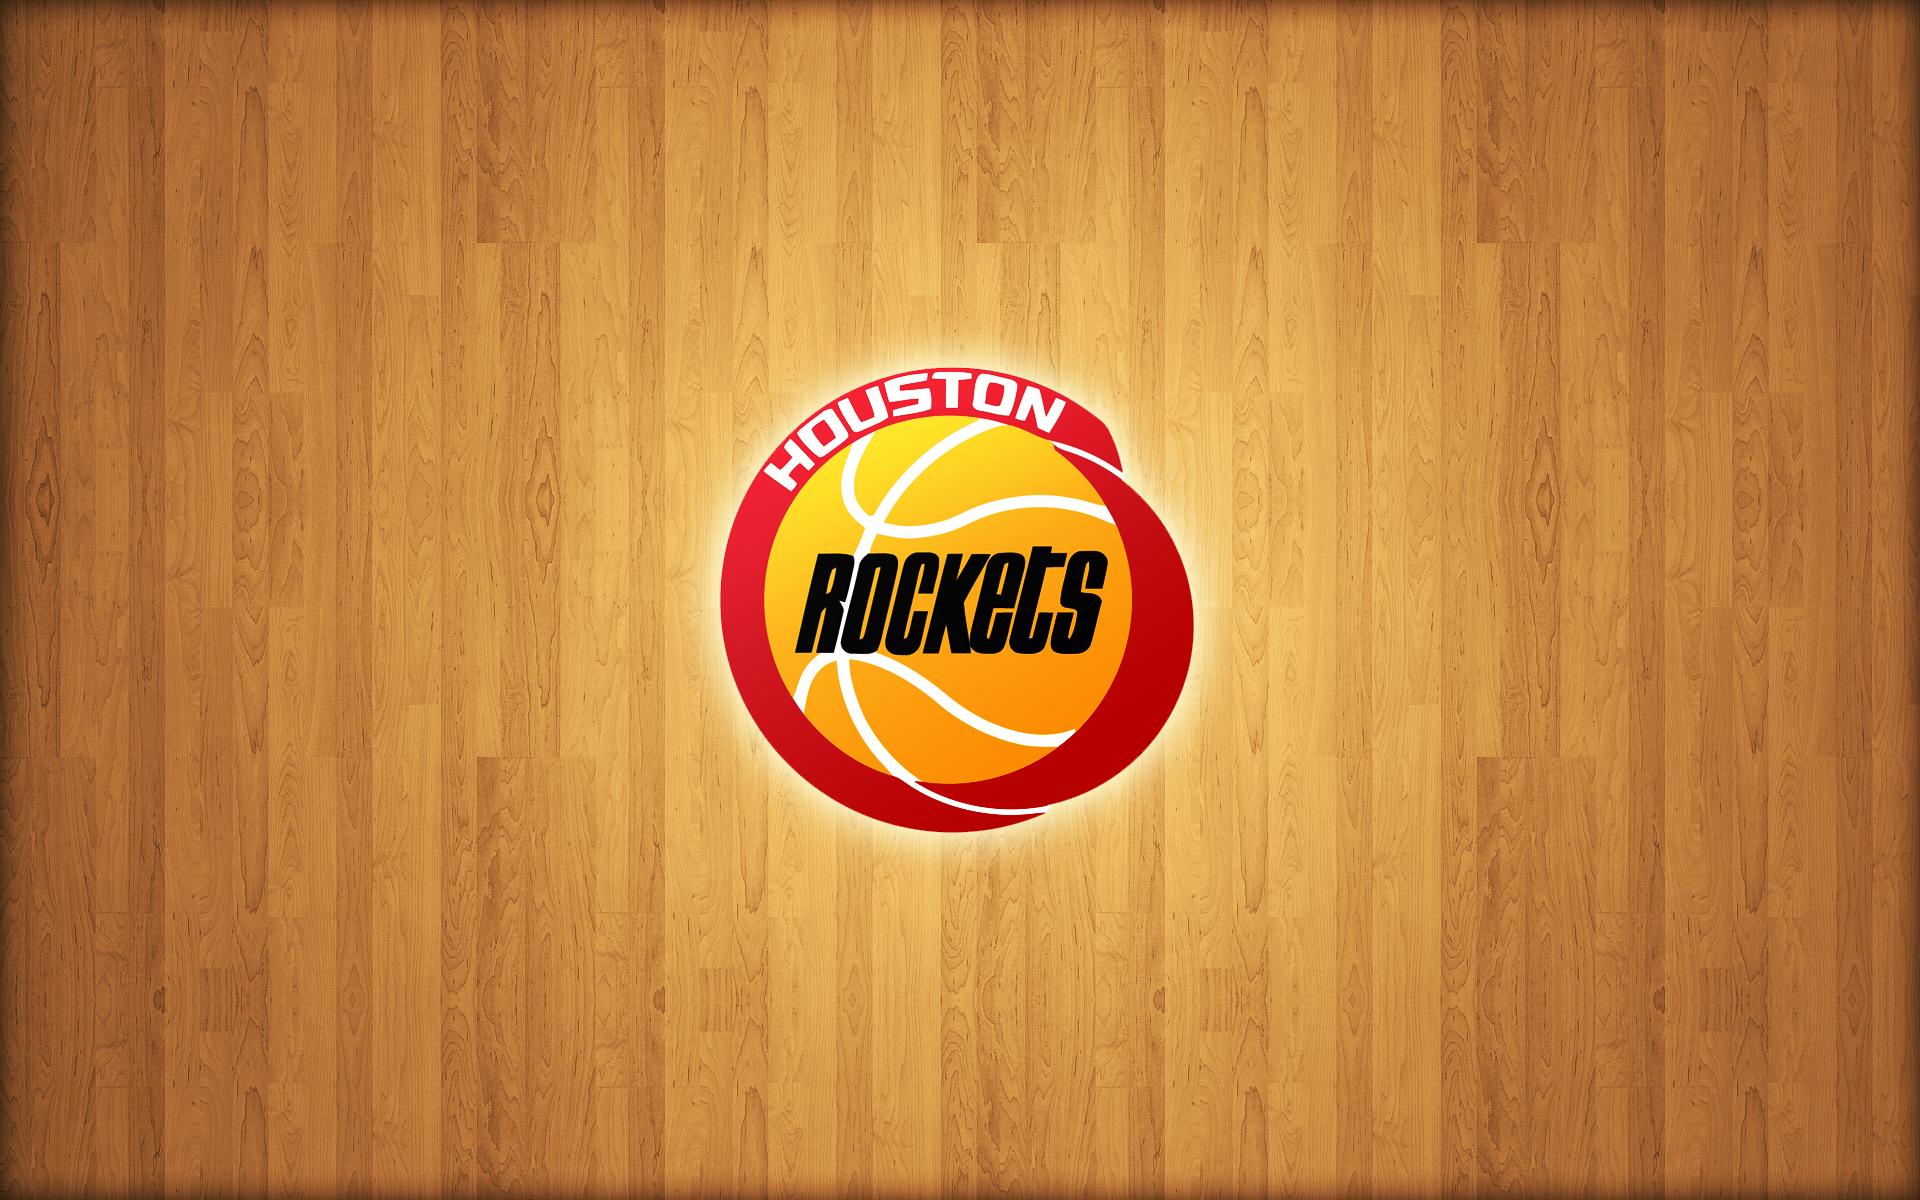 Houston Rockets HD Wallpaper | Background Image | 1920x1200 | ID:989172 - Wallpaper Abyss